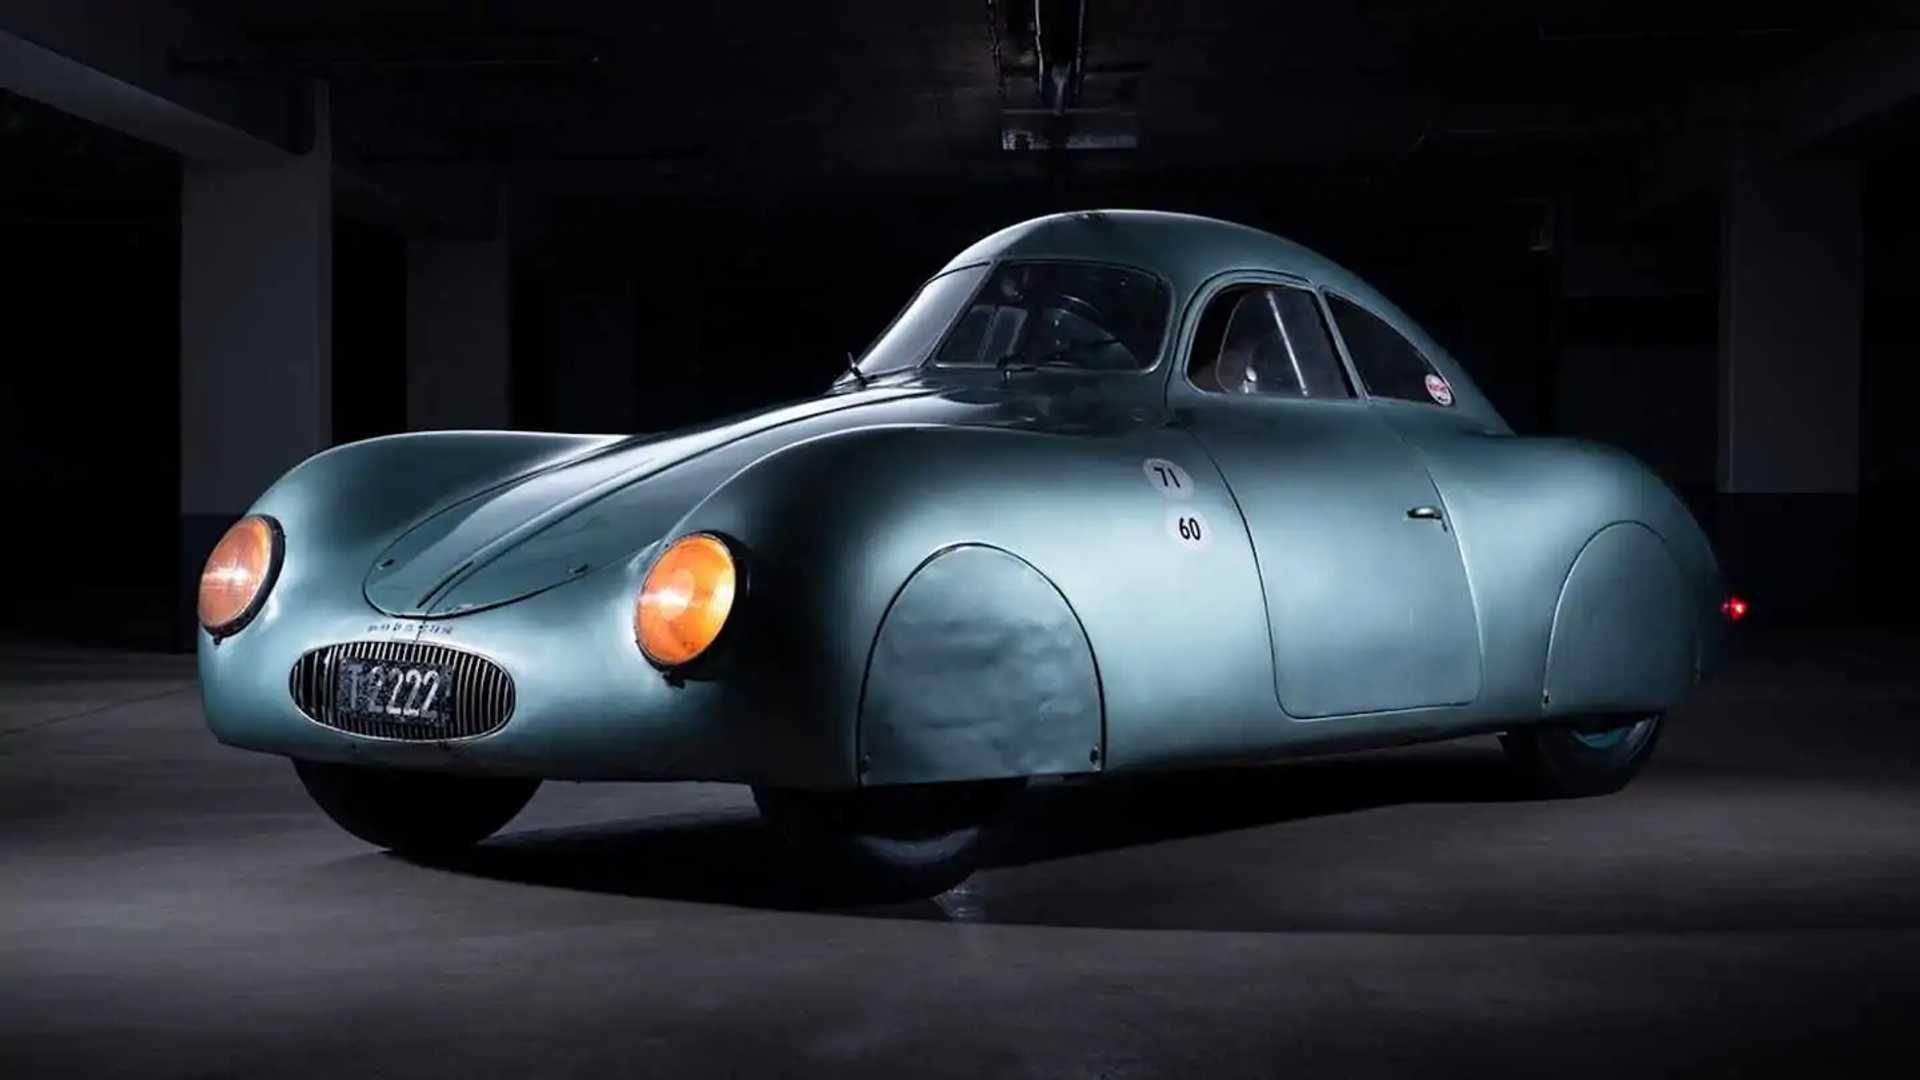 Porsche Type 64 At RM Sotheby's Monterey Auction